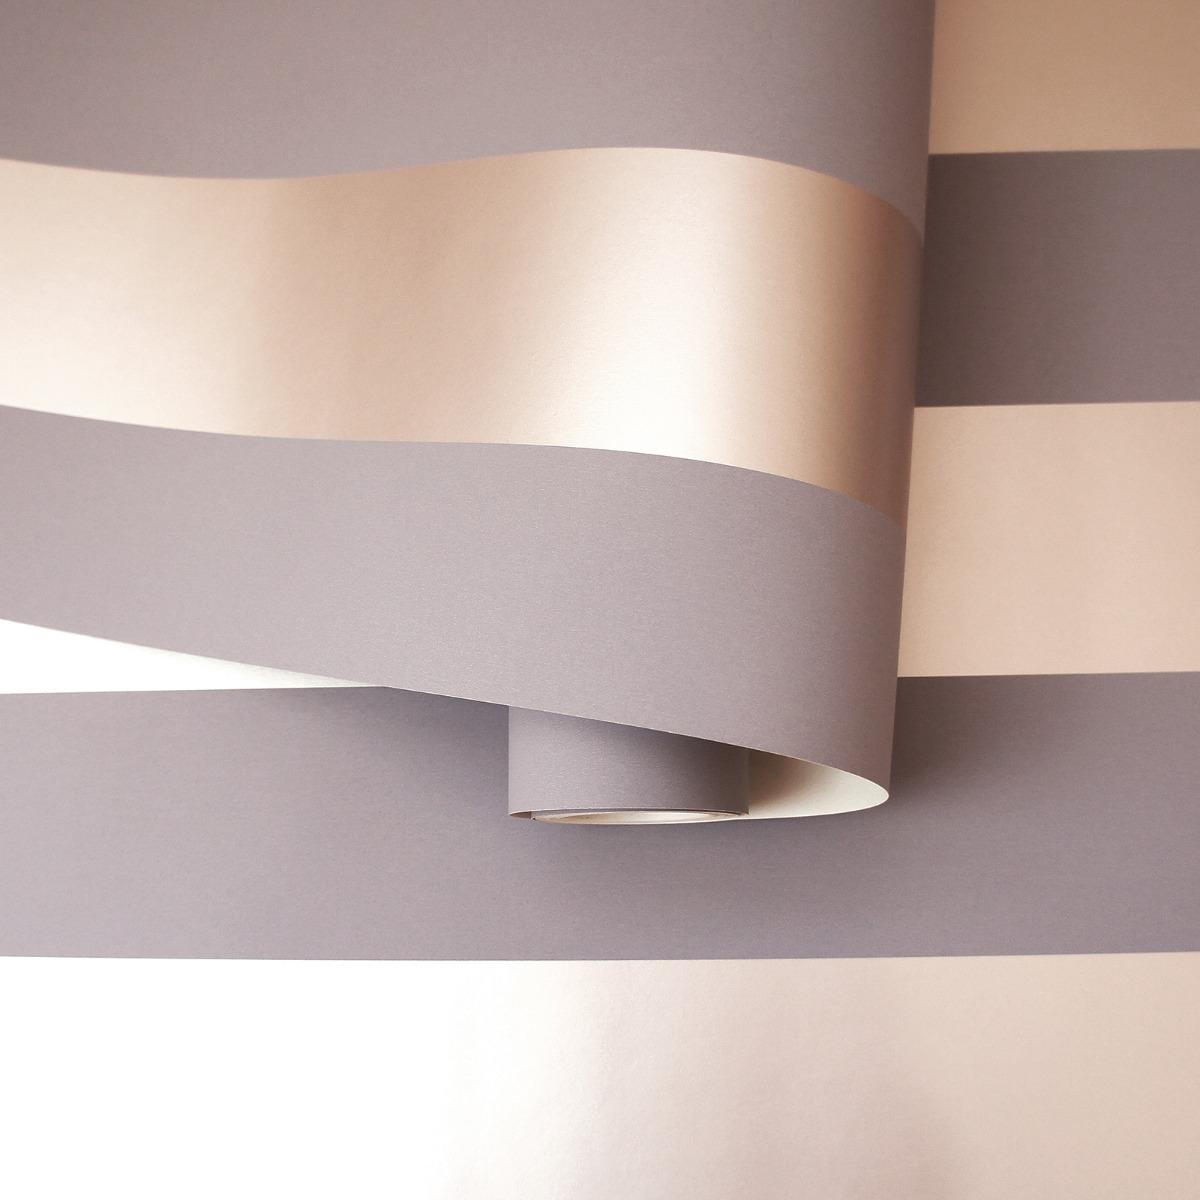 Dillan Stripe Wallpaper Grey / Rose Gold Holden 12762